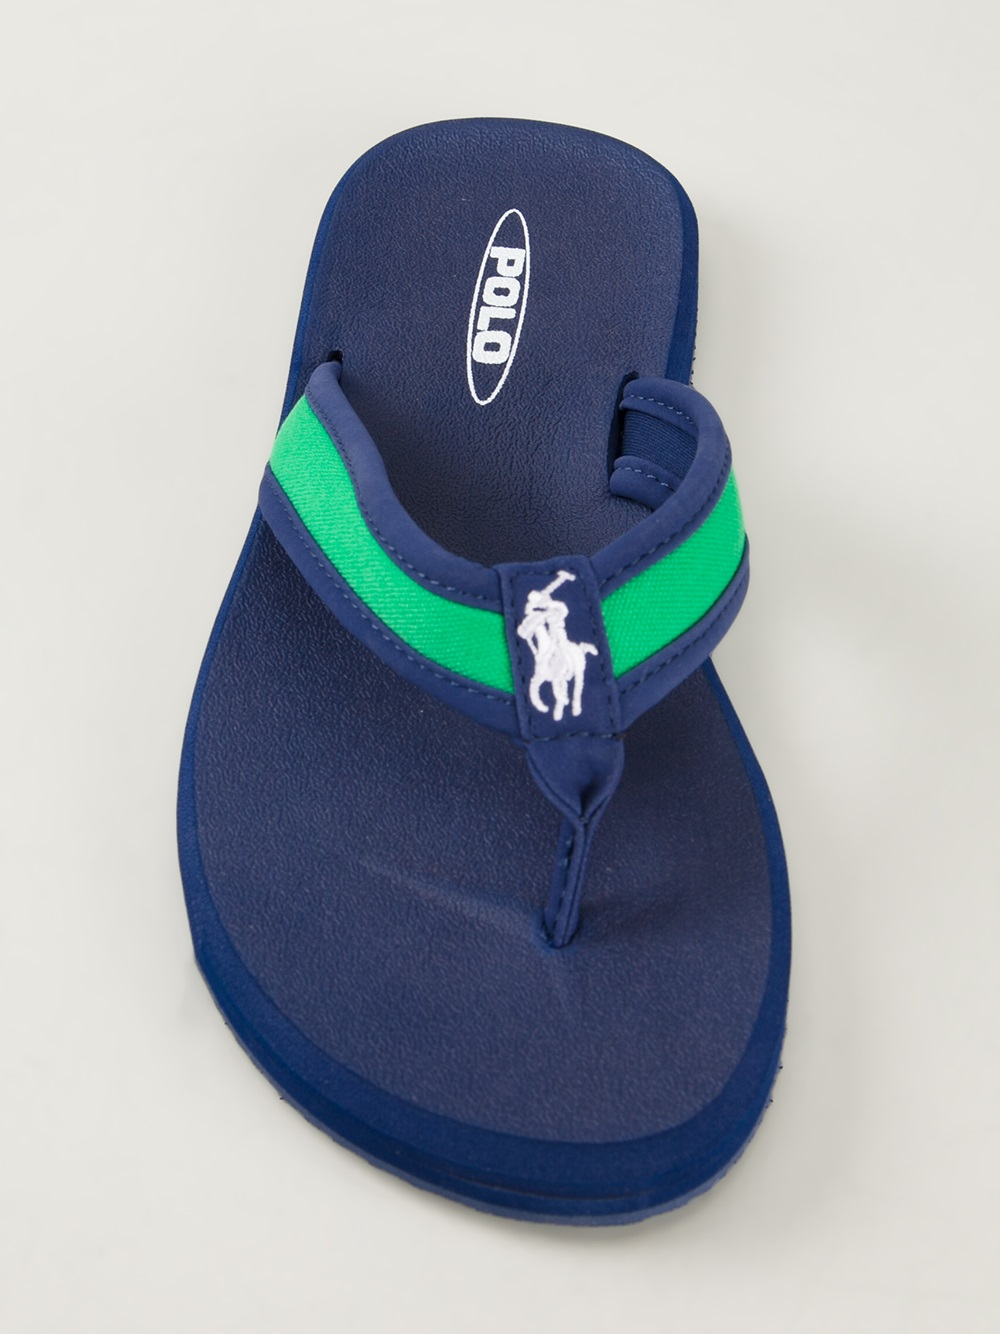 55a013224dc8f7 Lyst - Polo Ralph Lauren Almer Flip Flops in Green for Men